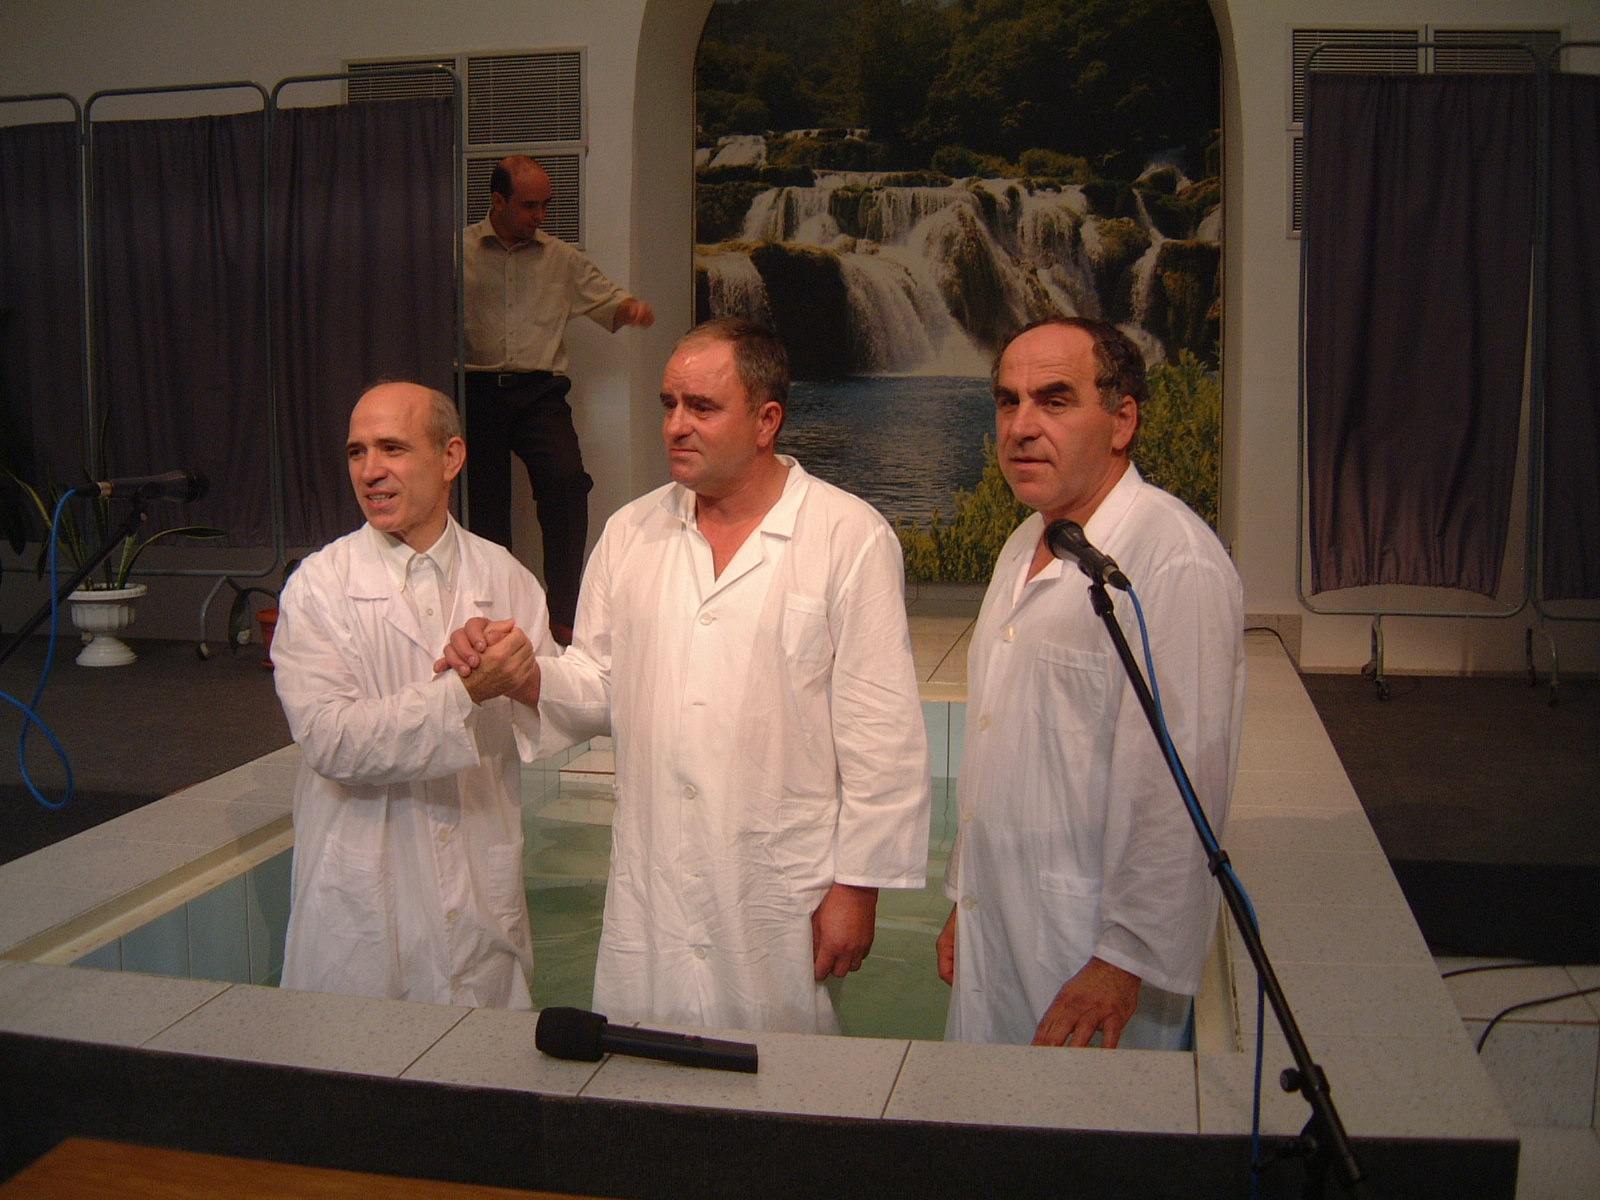 FRATE BOTEZAT DE VAZUT CINE ESTE 22 AUGUST 2003